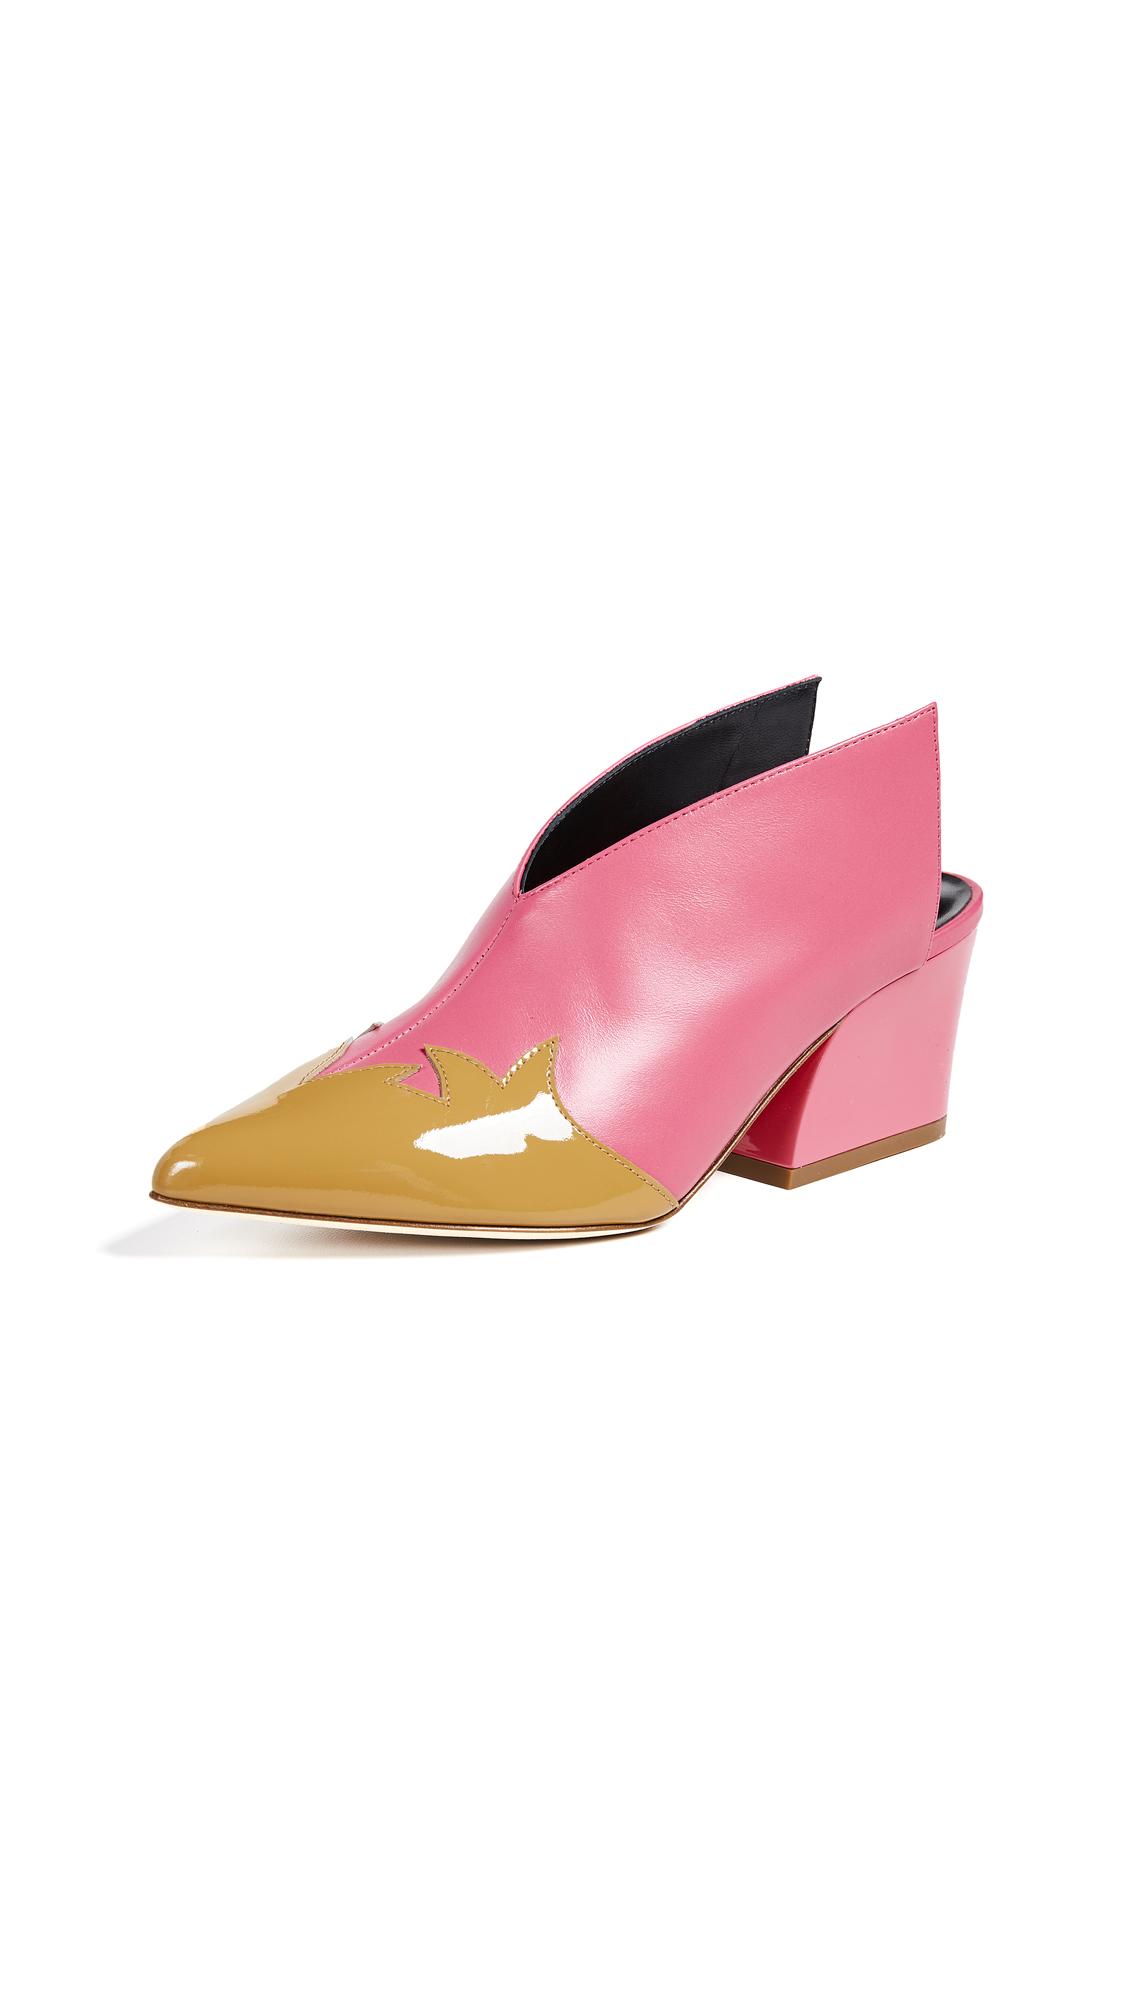 Tibi Floyd Mules - Pink/Taupe Multi